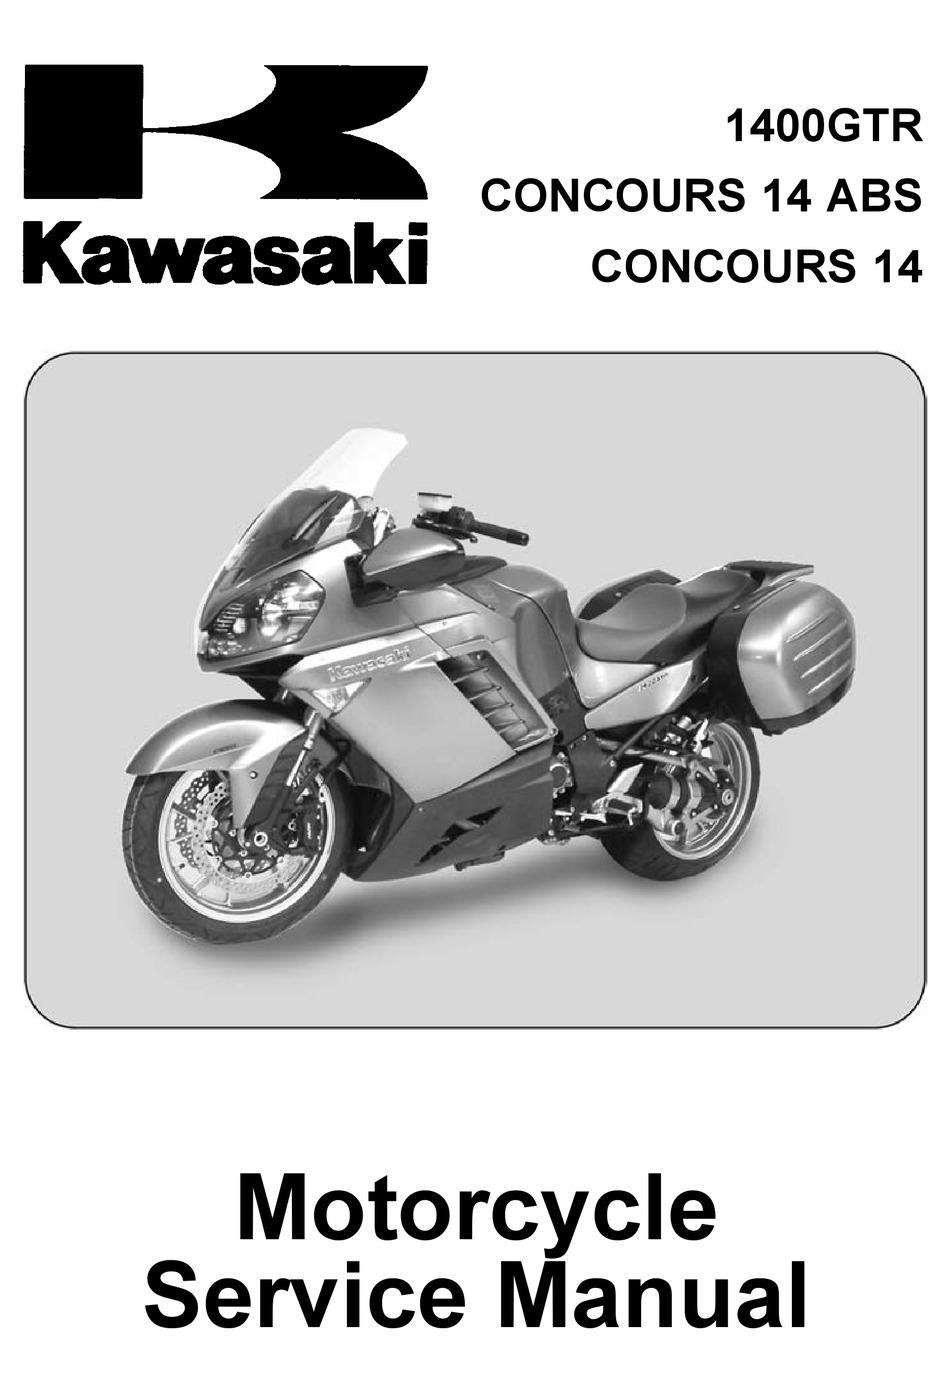 Kawasaki 1400gtr Service Manual Pdf Download Manualslib